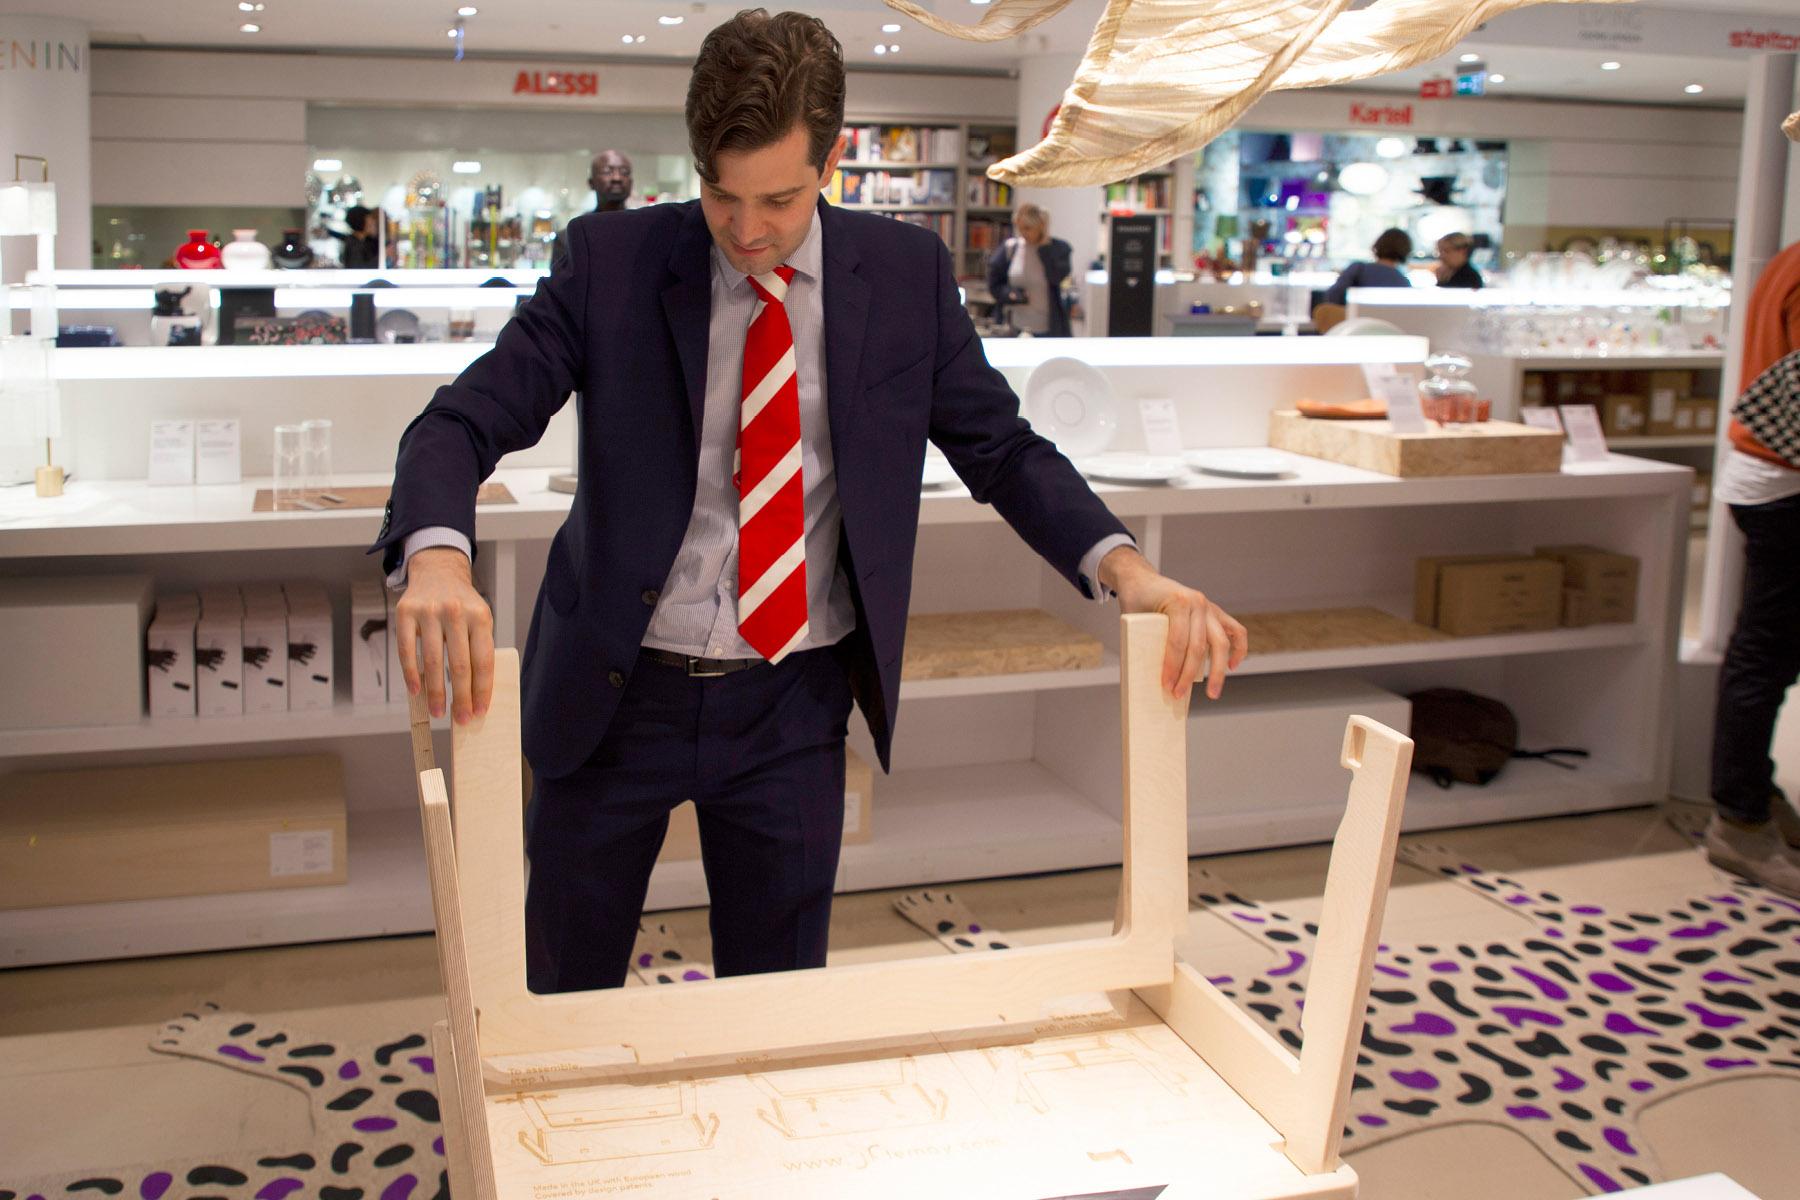 Jean-François assembling a coffee table